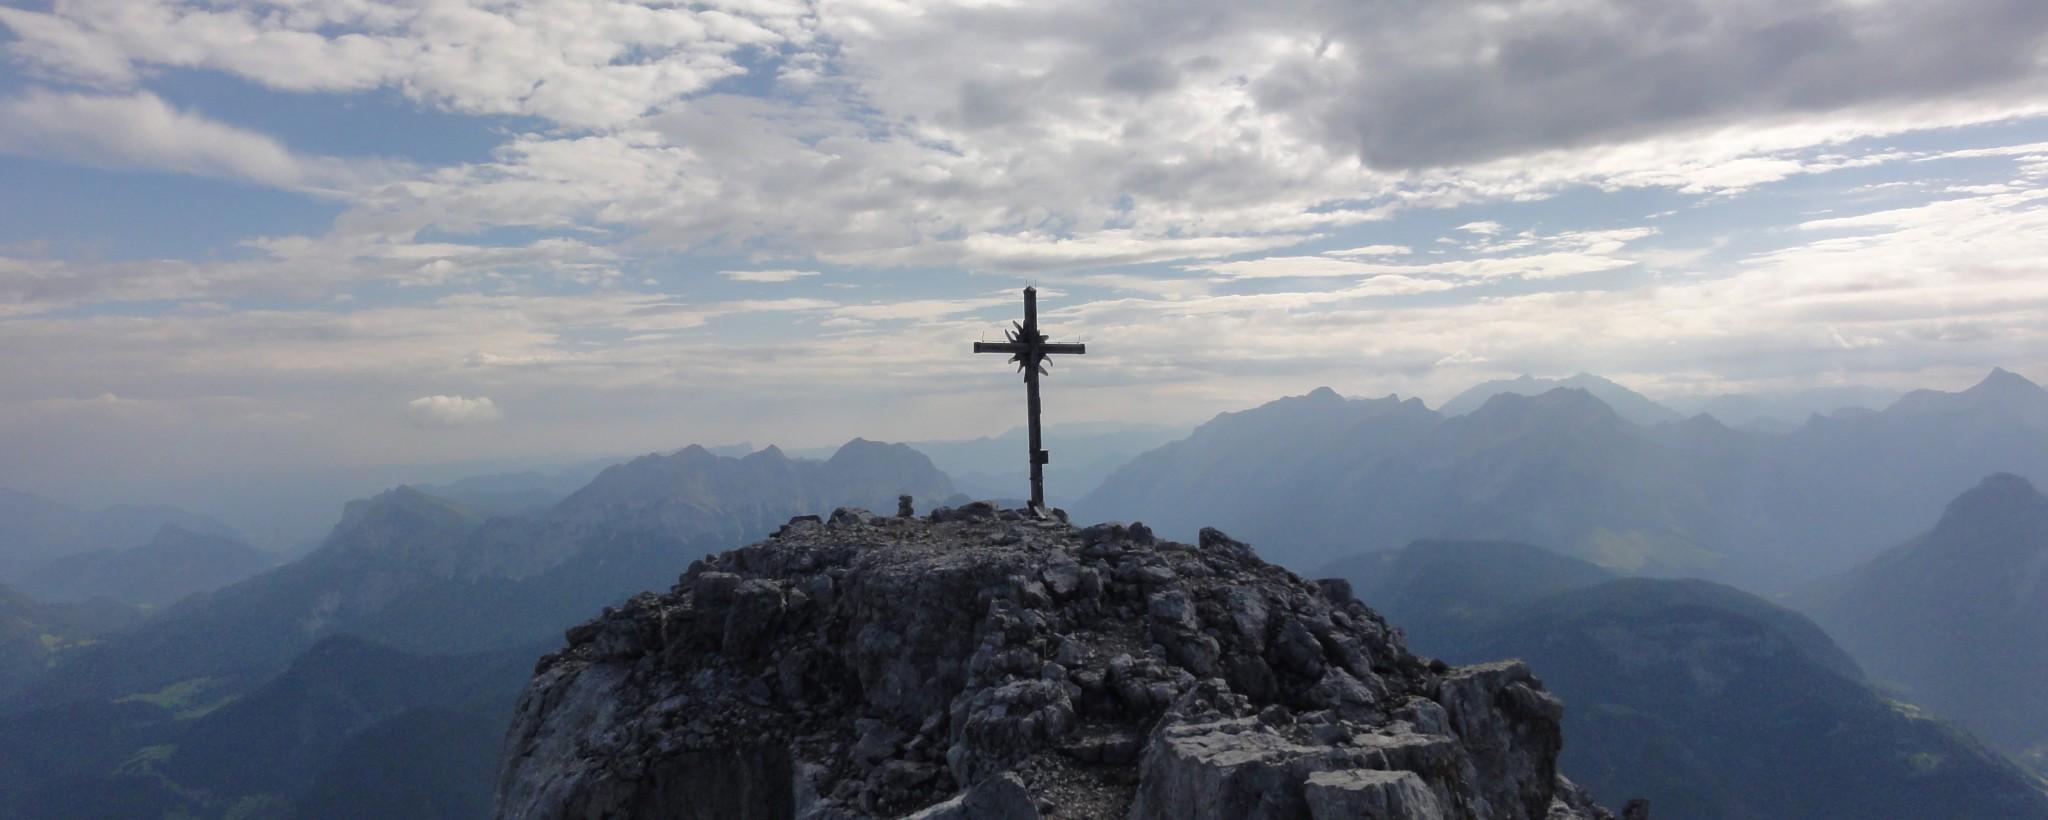 Arnoweg: Das Gipfelkreuz des Ochsenhorn